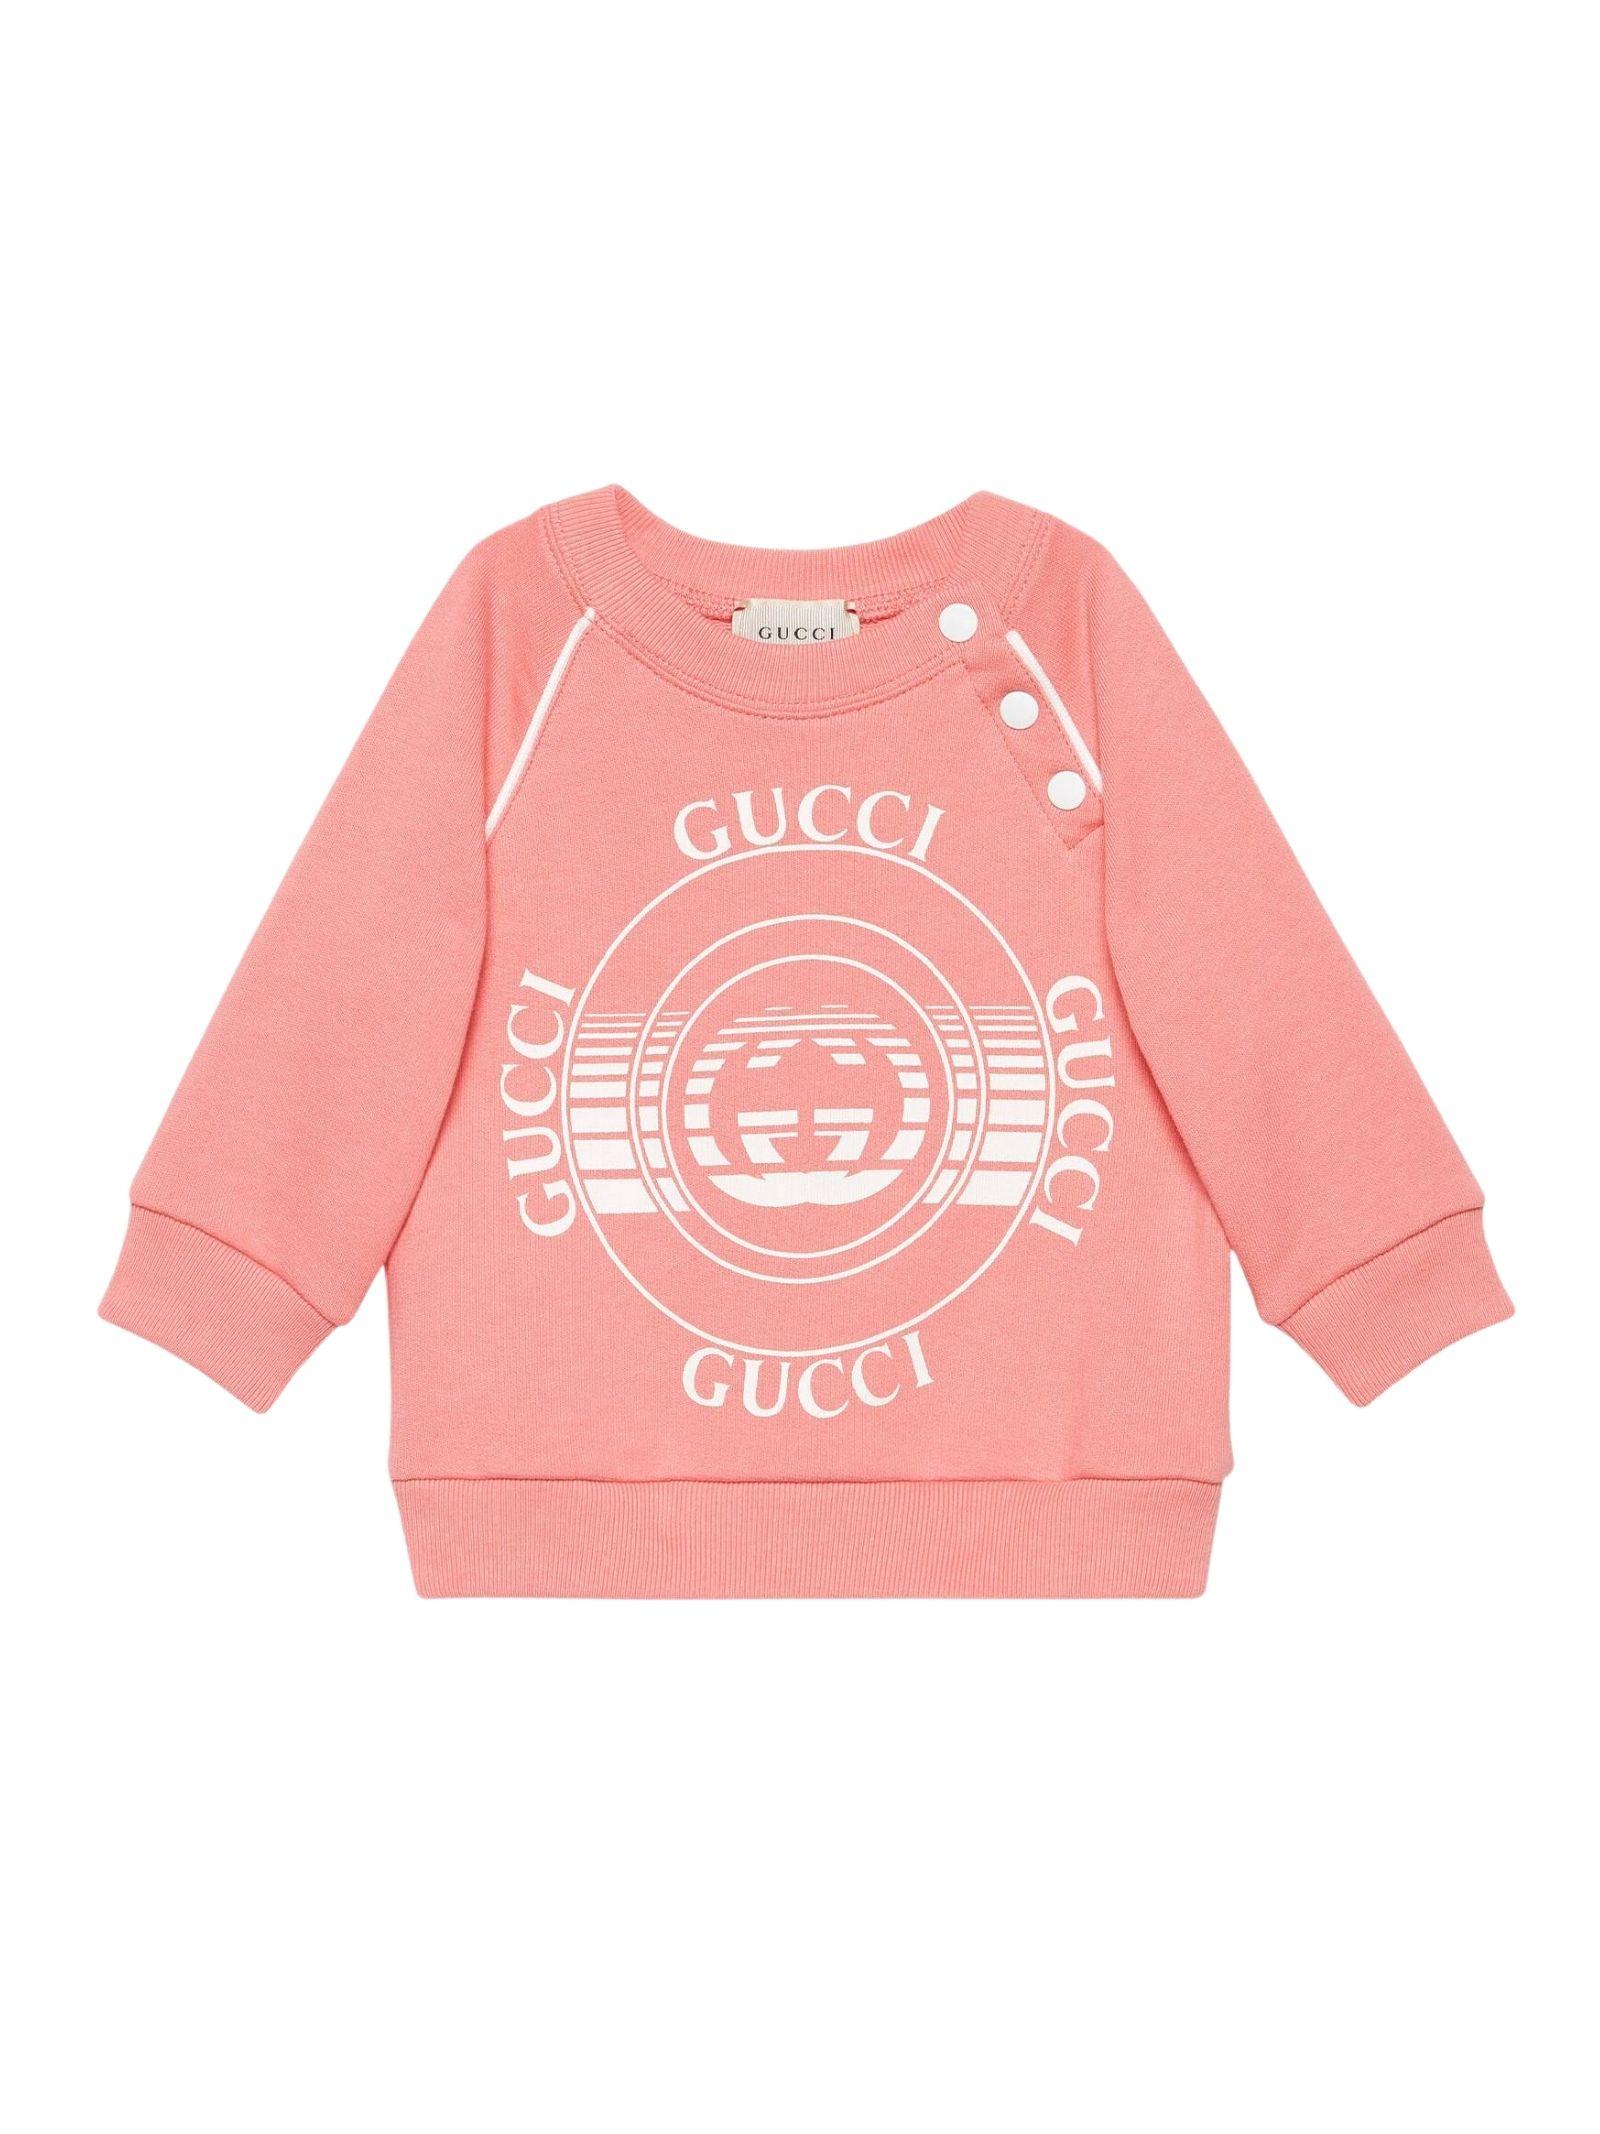 Gucci | Felpa | 647900 XJC7E6152